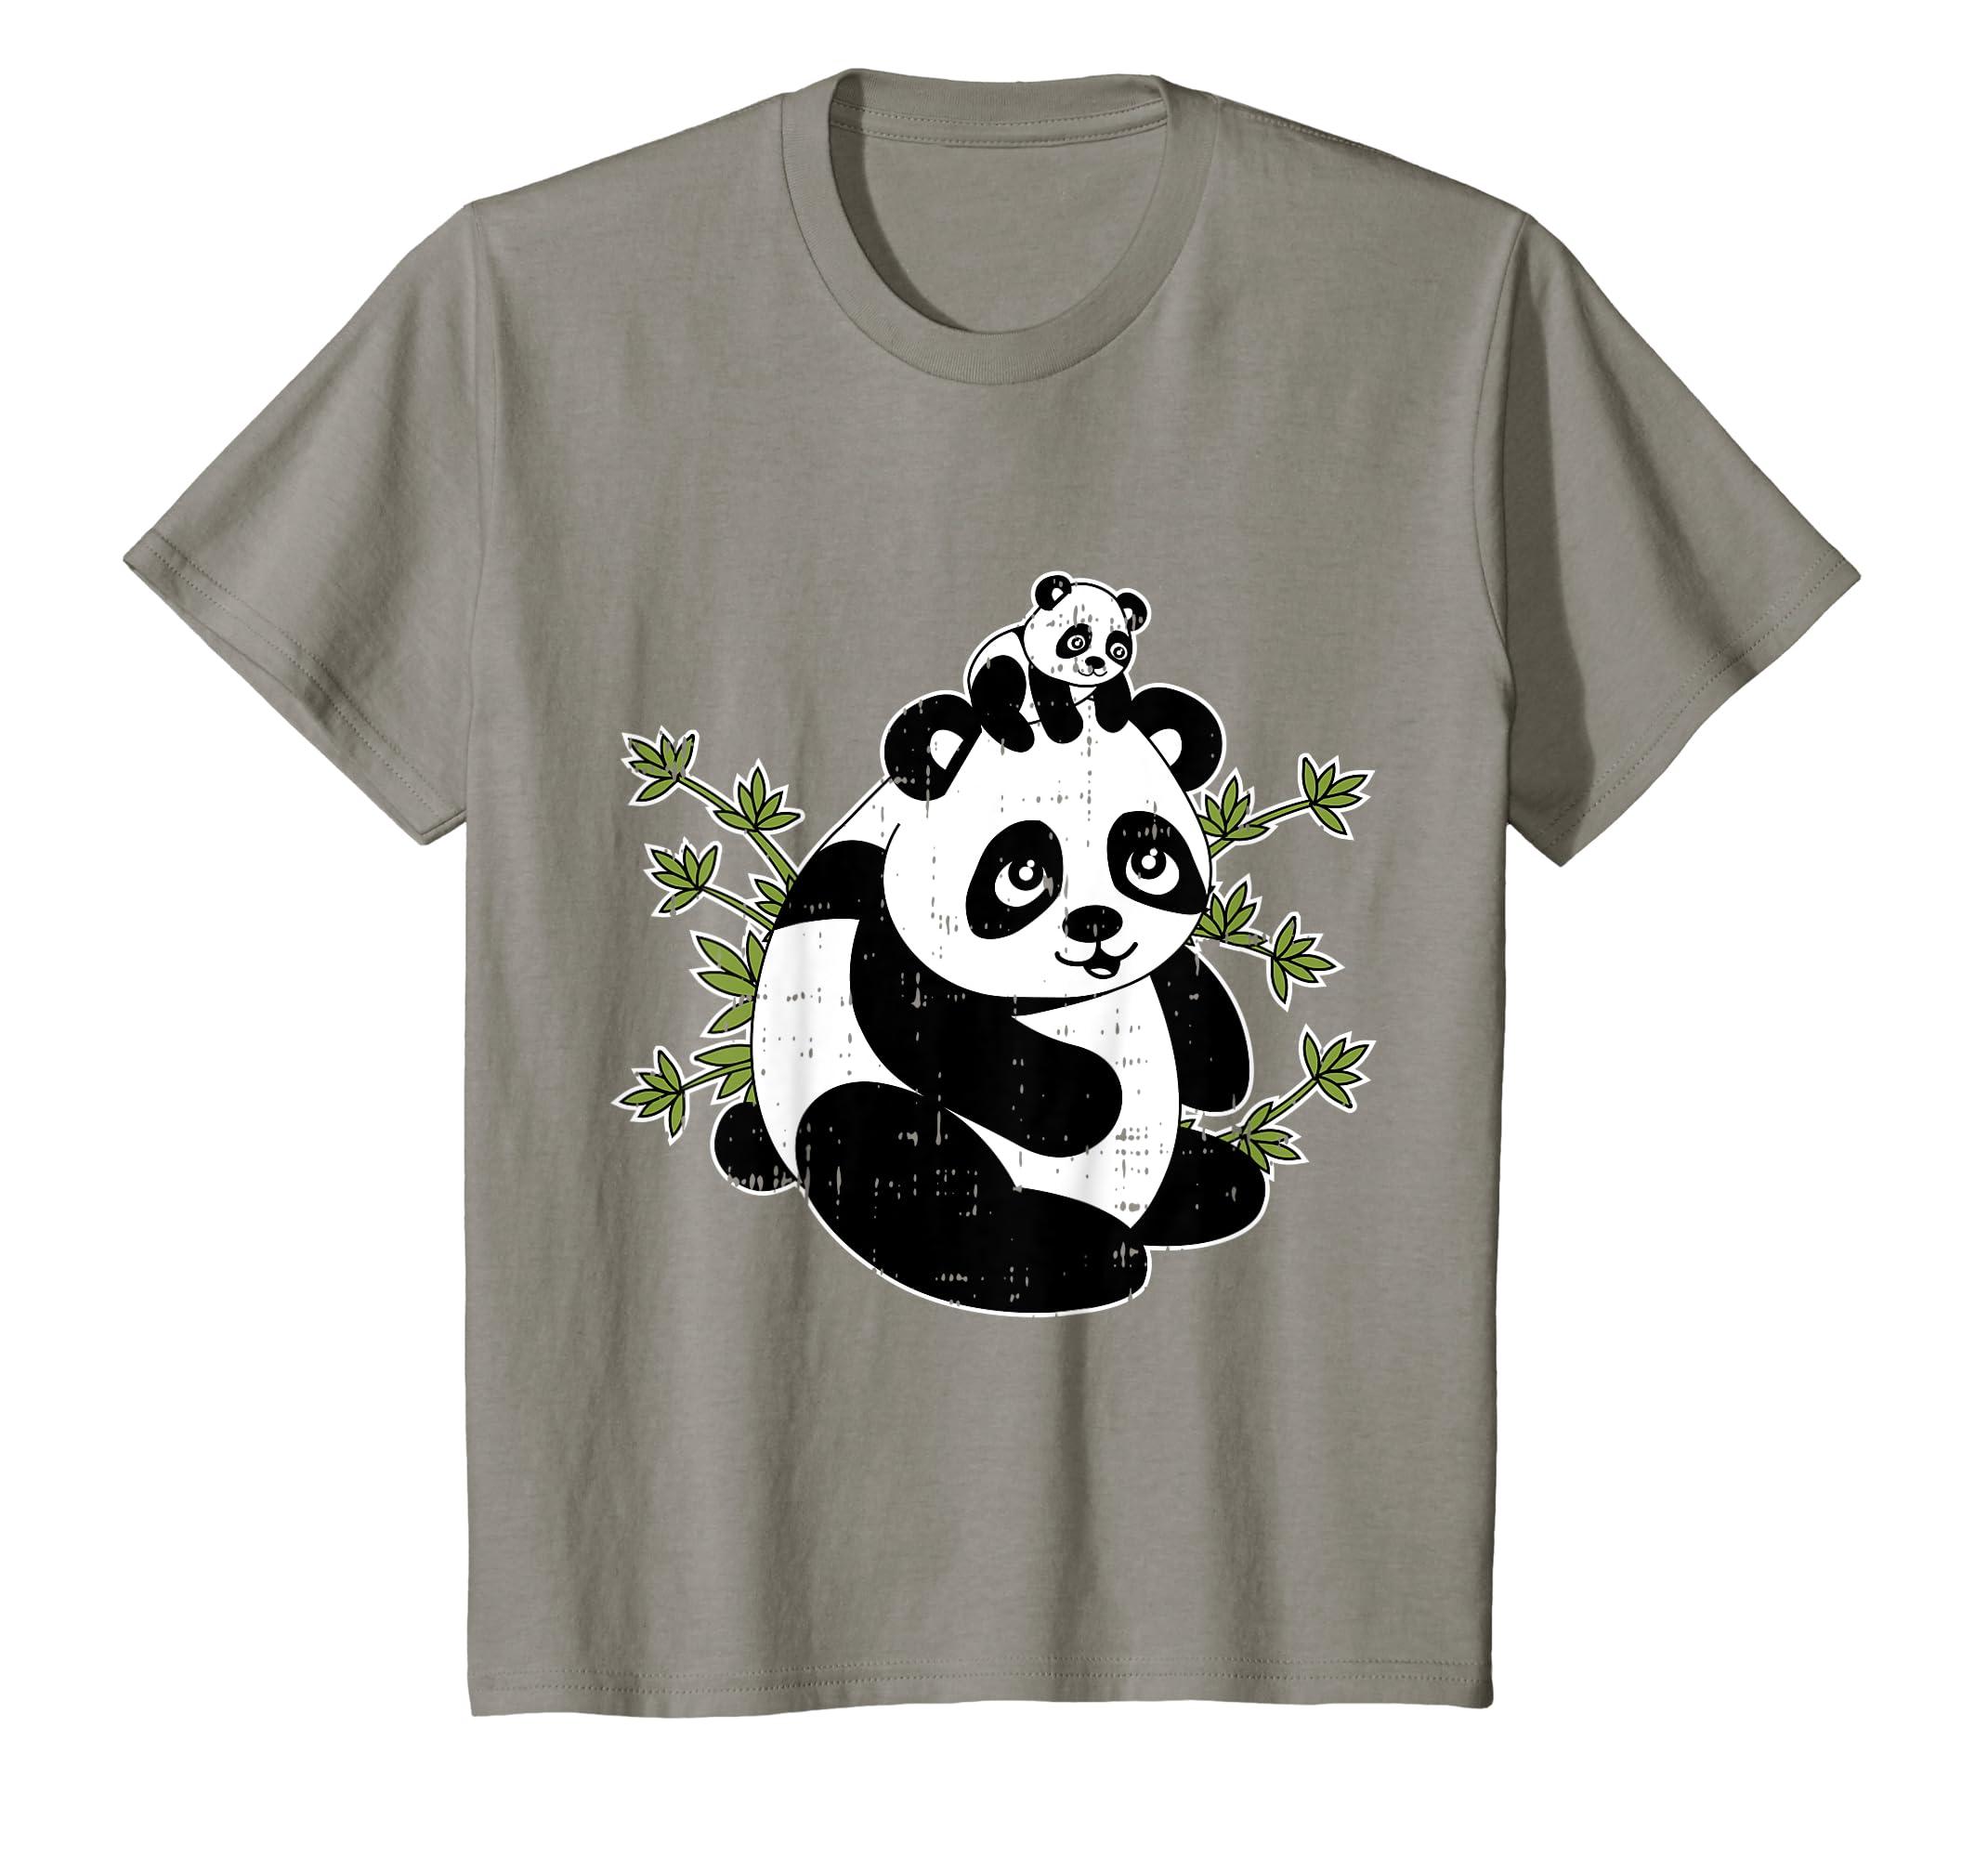 46a91f980575 Amazon.com: Papa Bear Panda Dad Baby Daddy Tee Cute Fathers Day Gift T-Shirt:  Clothing